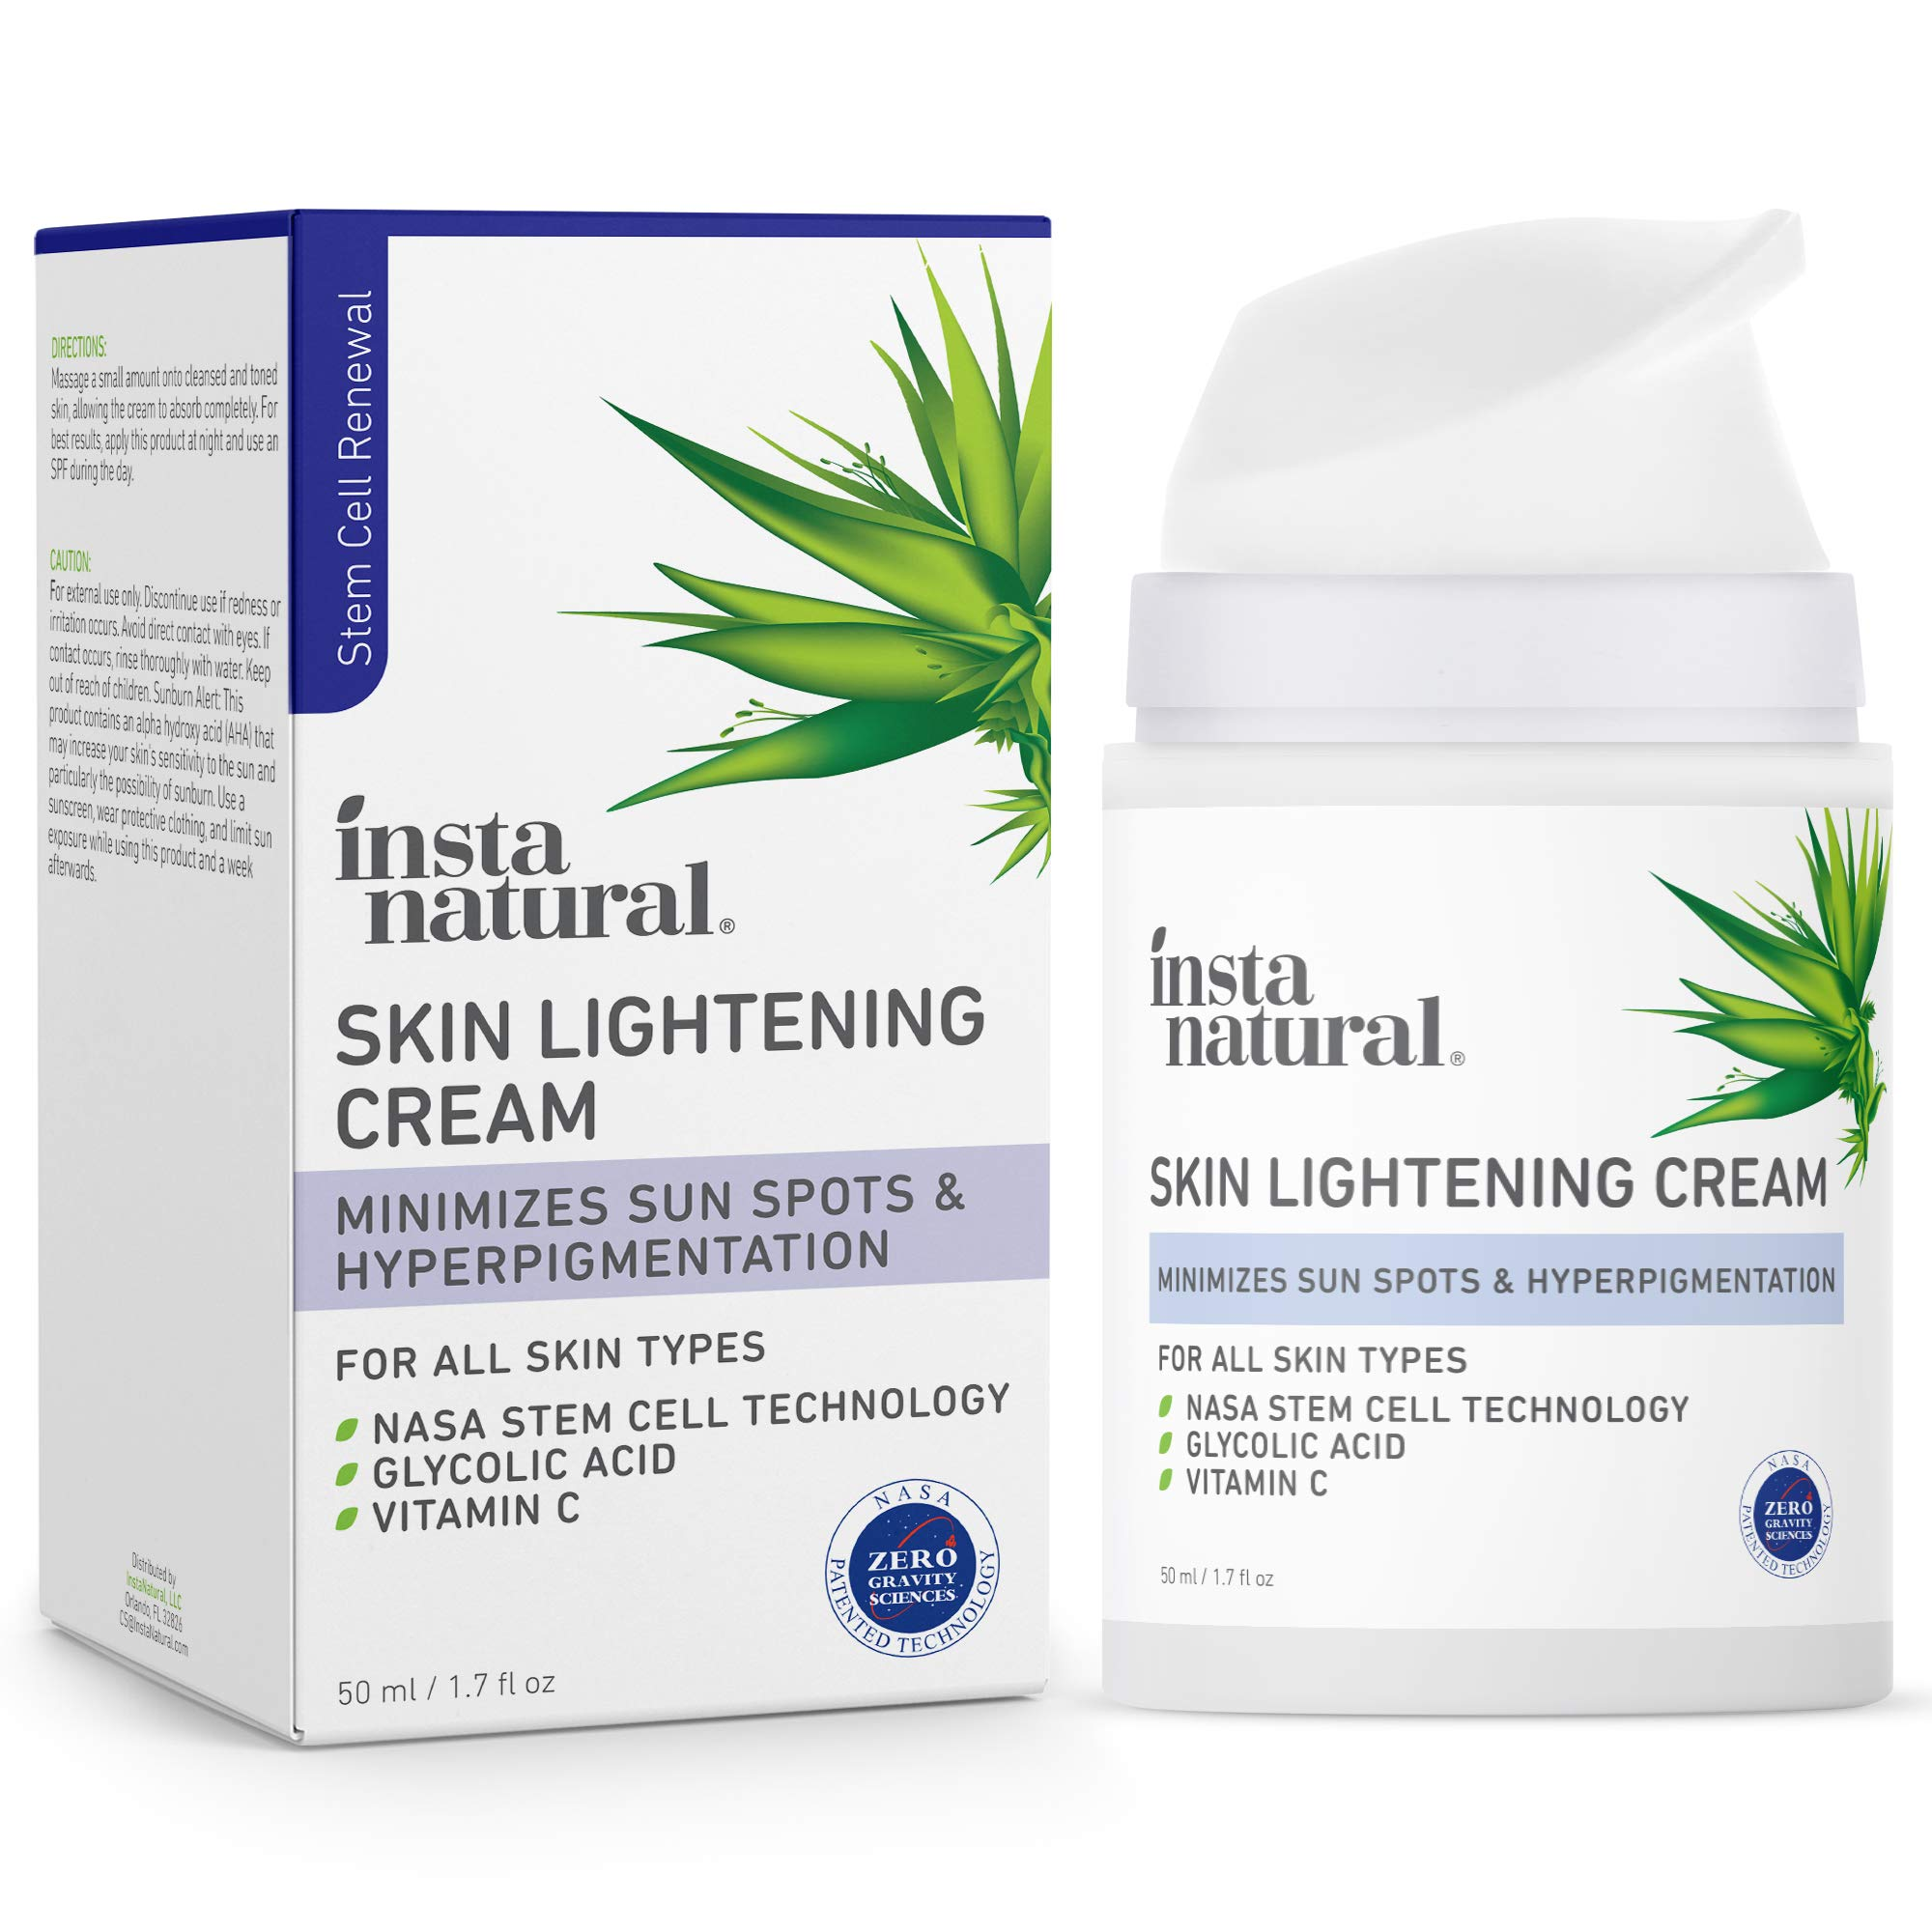 Brightening Facial Cream - Dark Spot Corrector & Remover - Scar Removal, Facial Sun & Age Spot Reducer & Brightening Hyperpigmentation Treatment Face Lotion for Women with Vitamin C - 1.7 oz